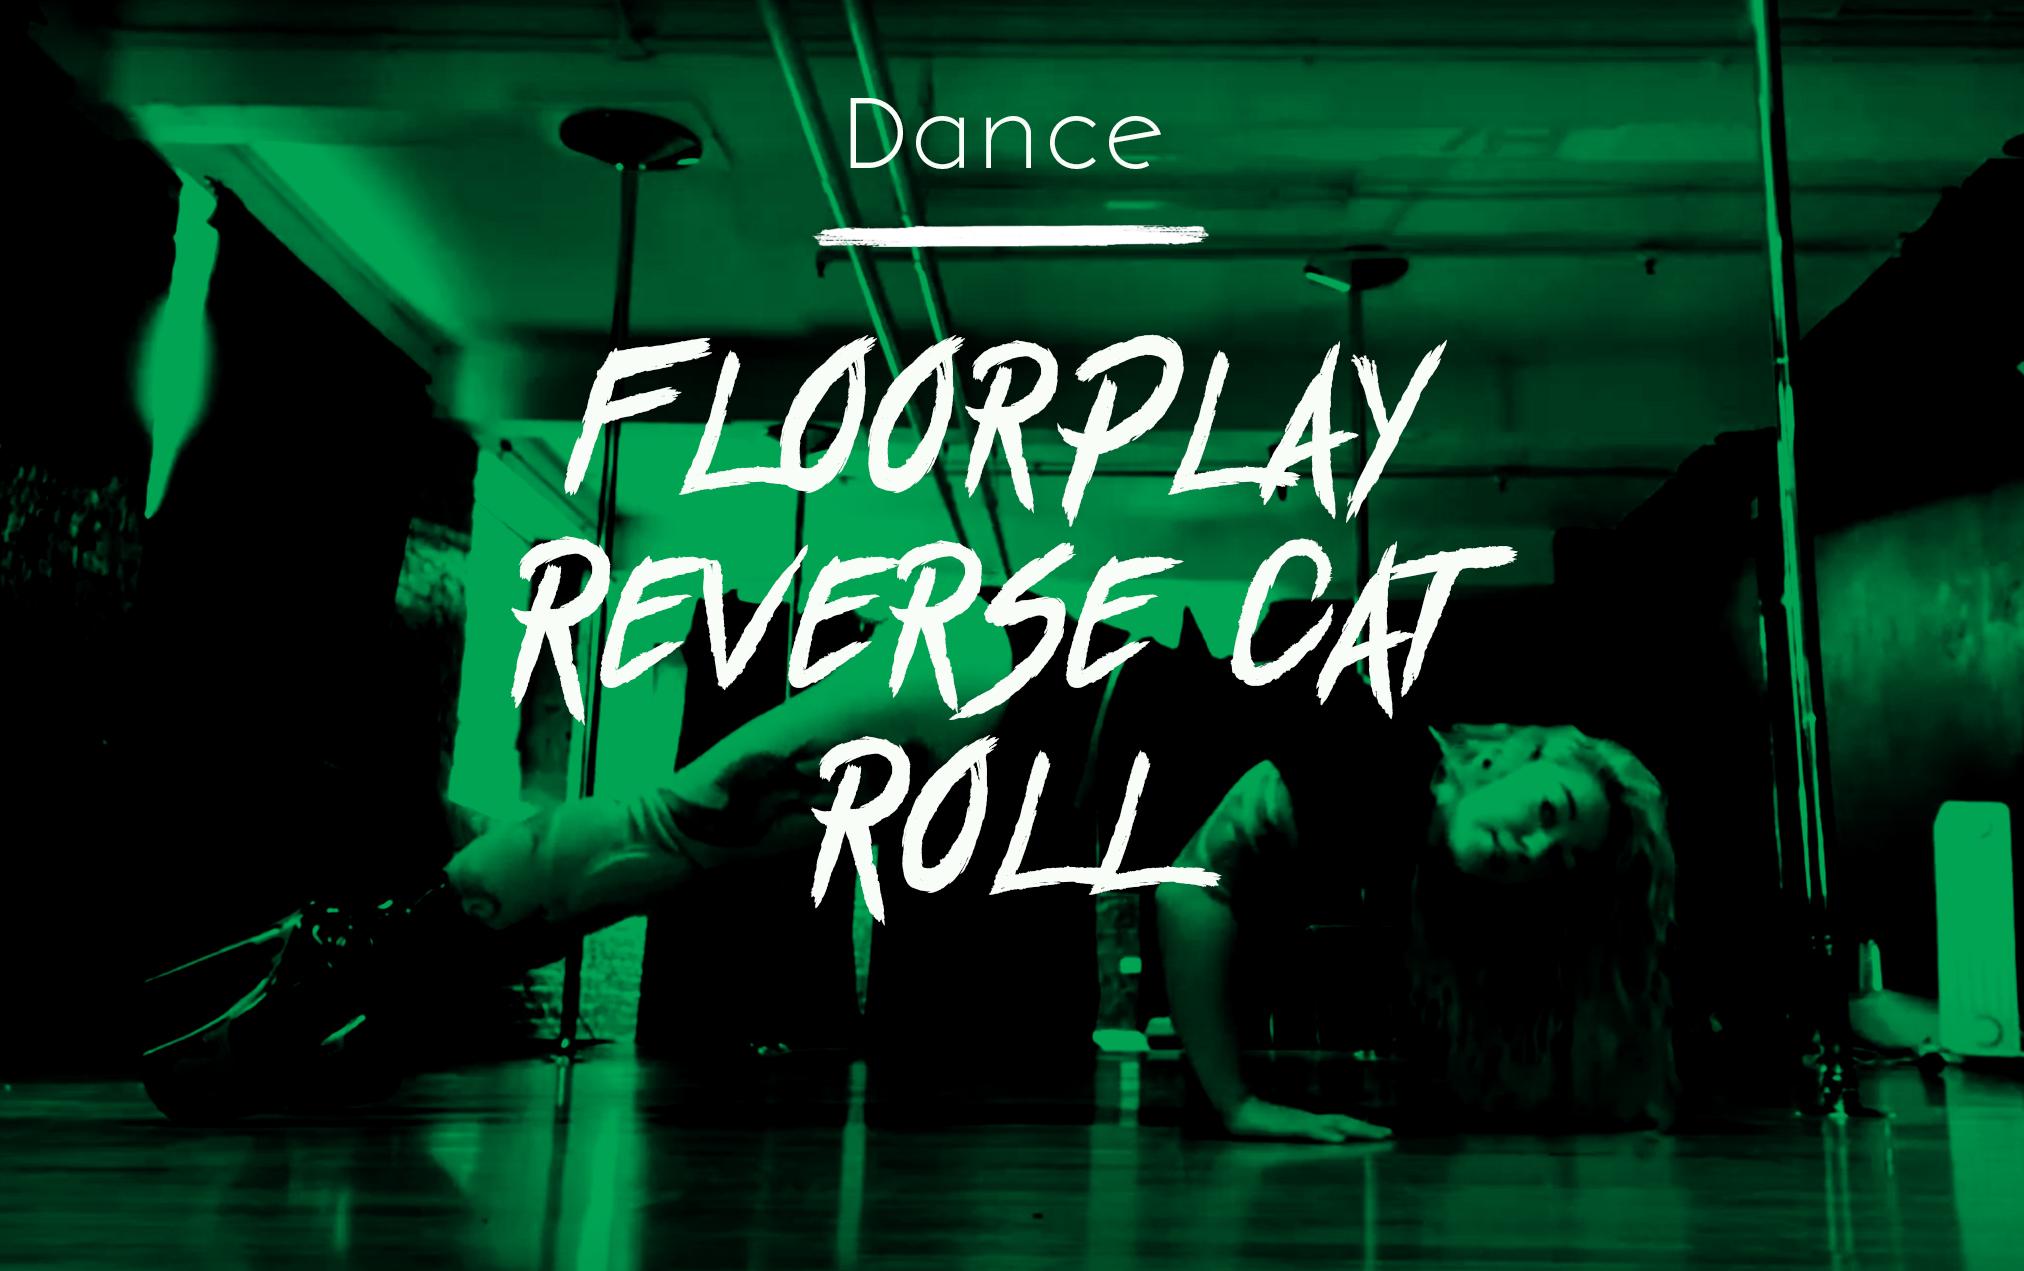 Reverse Cat Roll